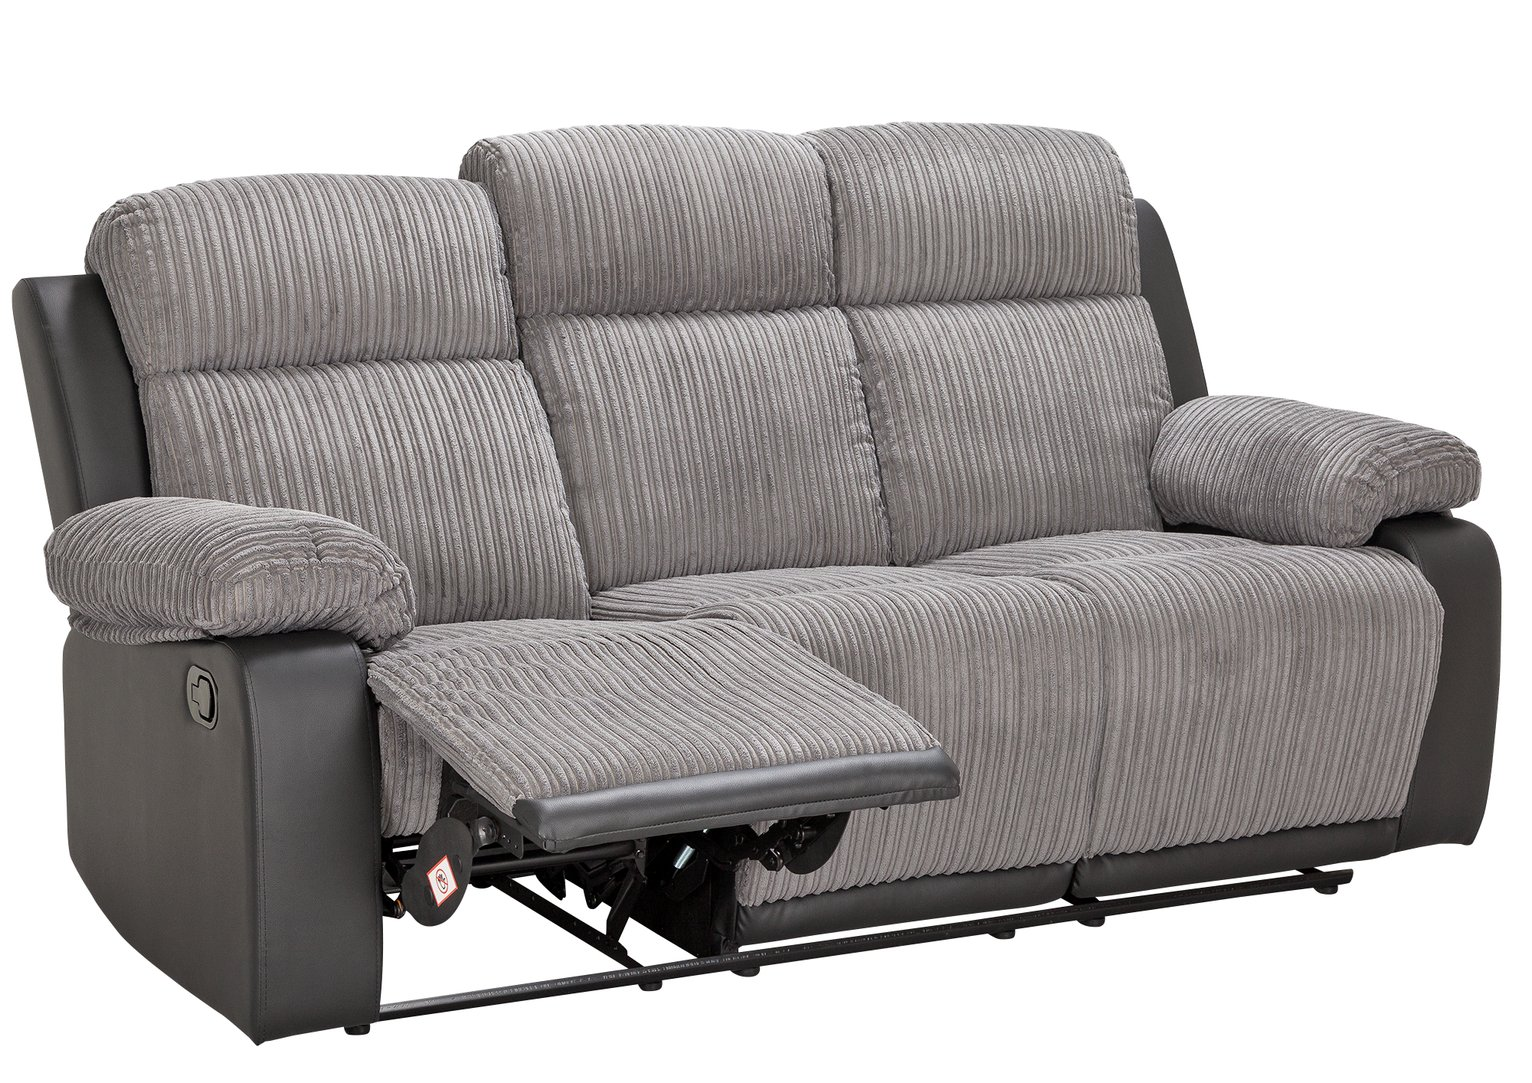 Buy Argos Home Bradley 3 Seater Fabric Recliner Sofa   Charcoal   Sofas    Argos